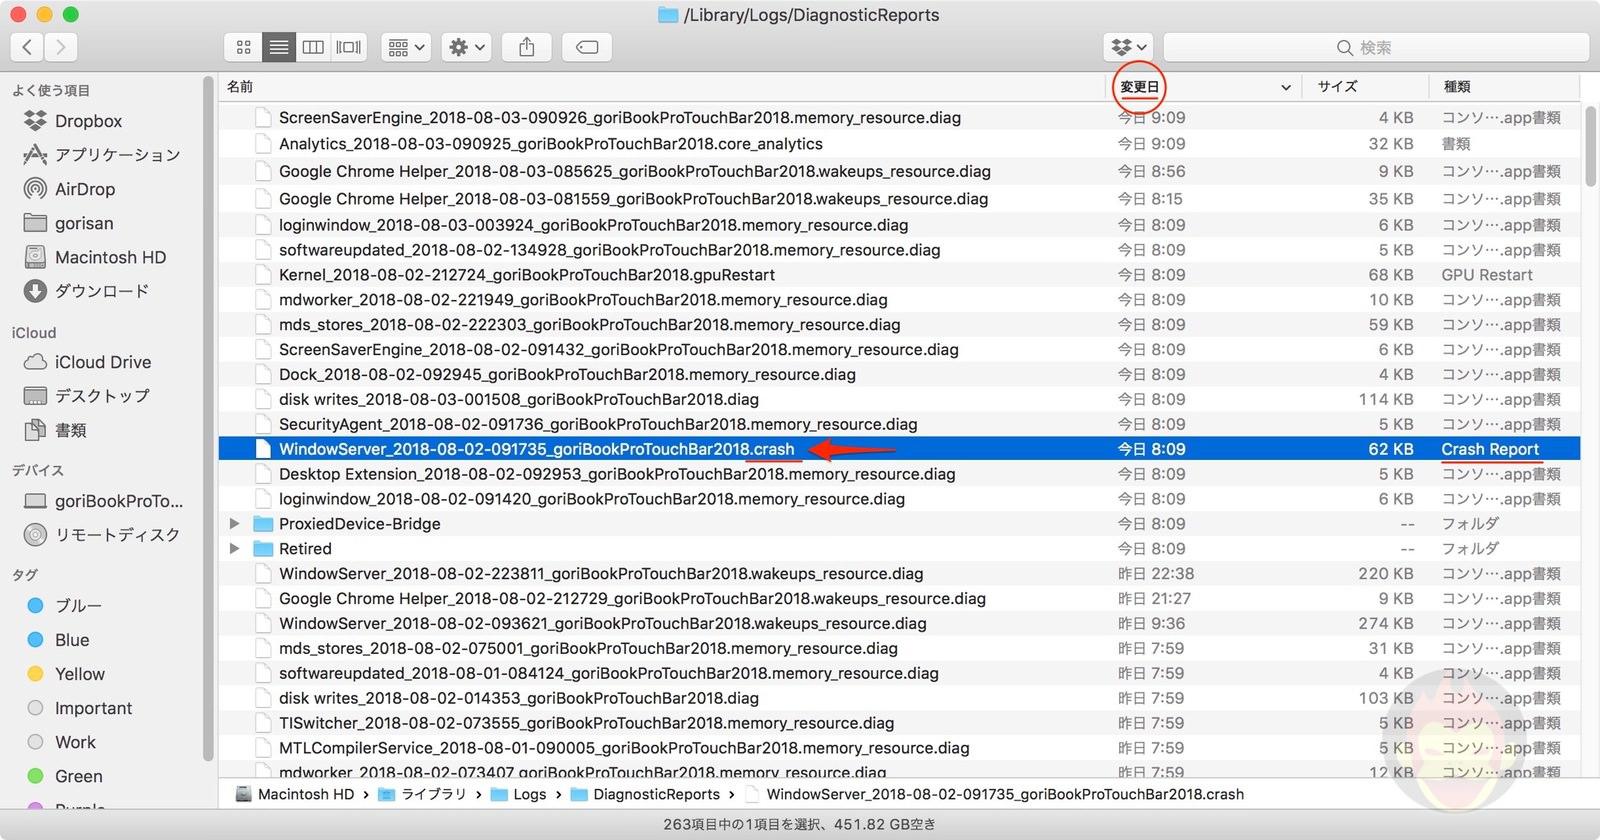 MacBook-Pro-Crash-Report-Log-02.jpg